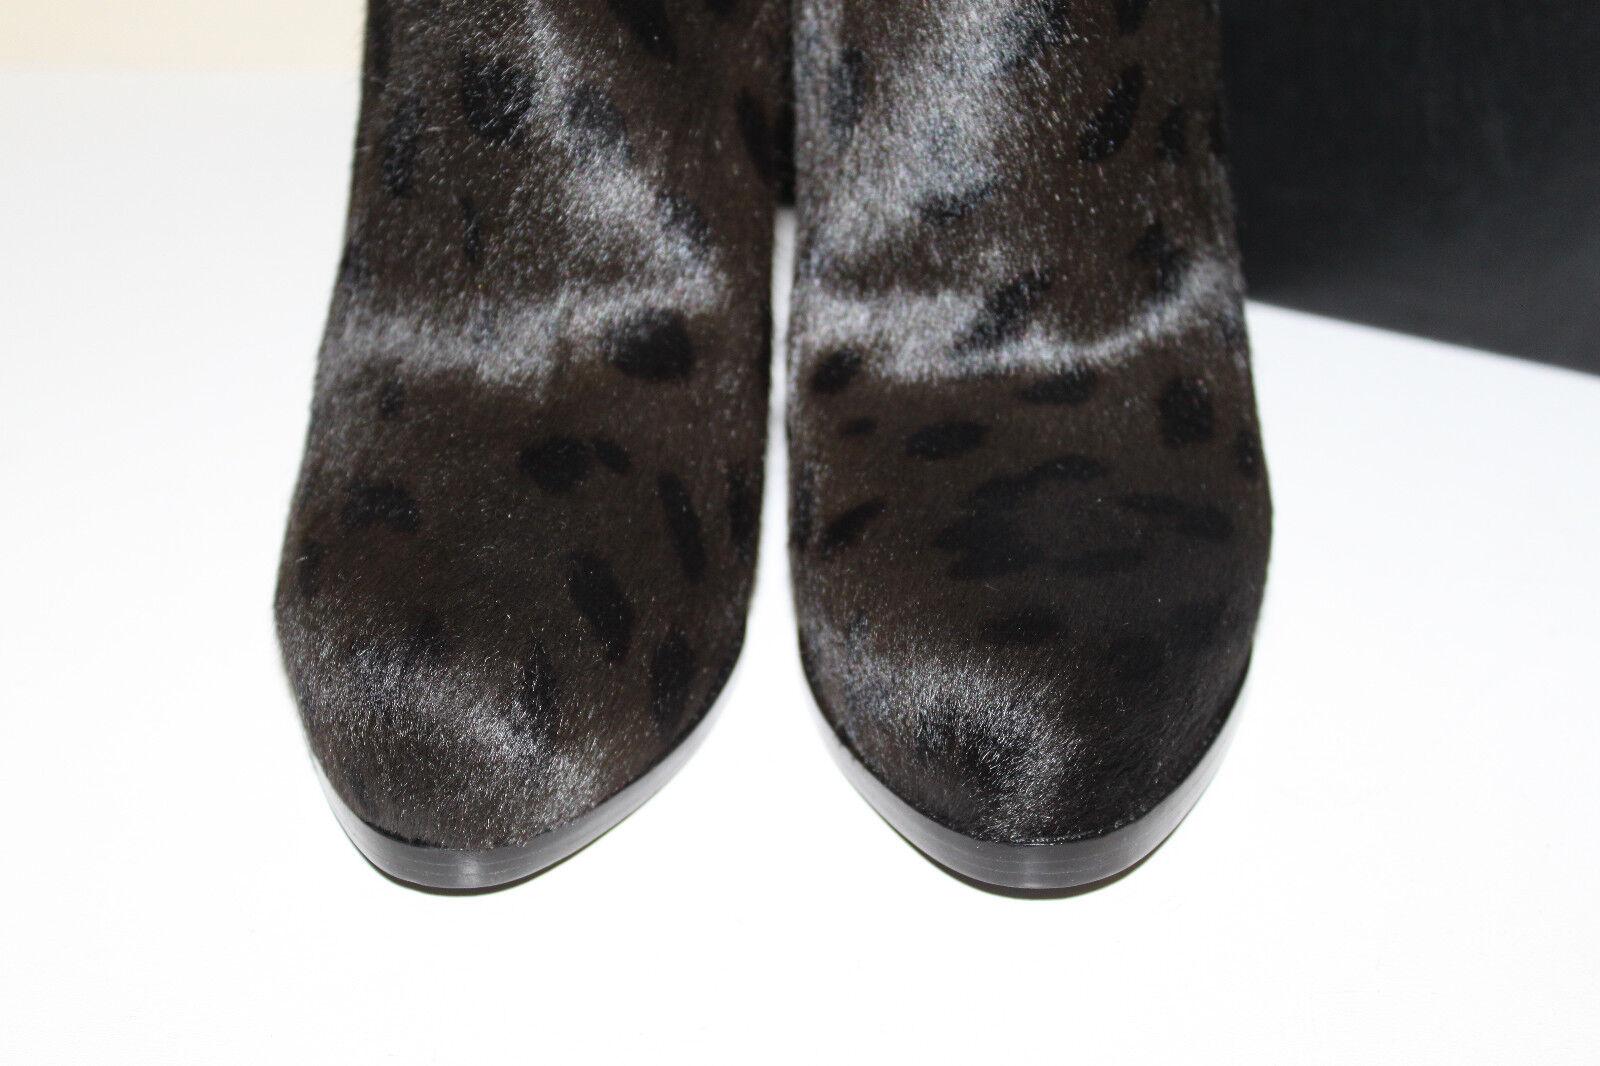 New Alexander Wang Leopard Pony Hair schuhes Platform Aymeline High Boot schuhes Hair sz 9 / 39 4c3a0f